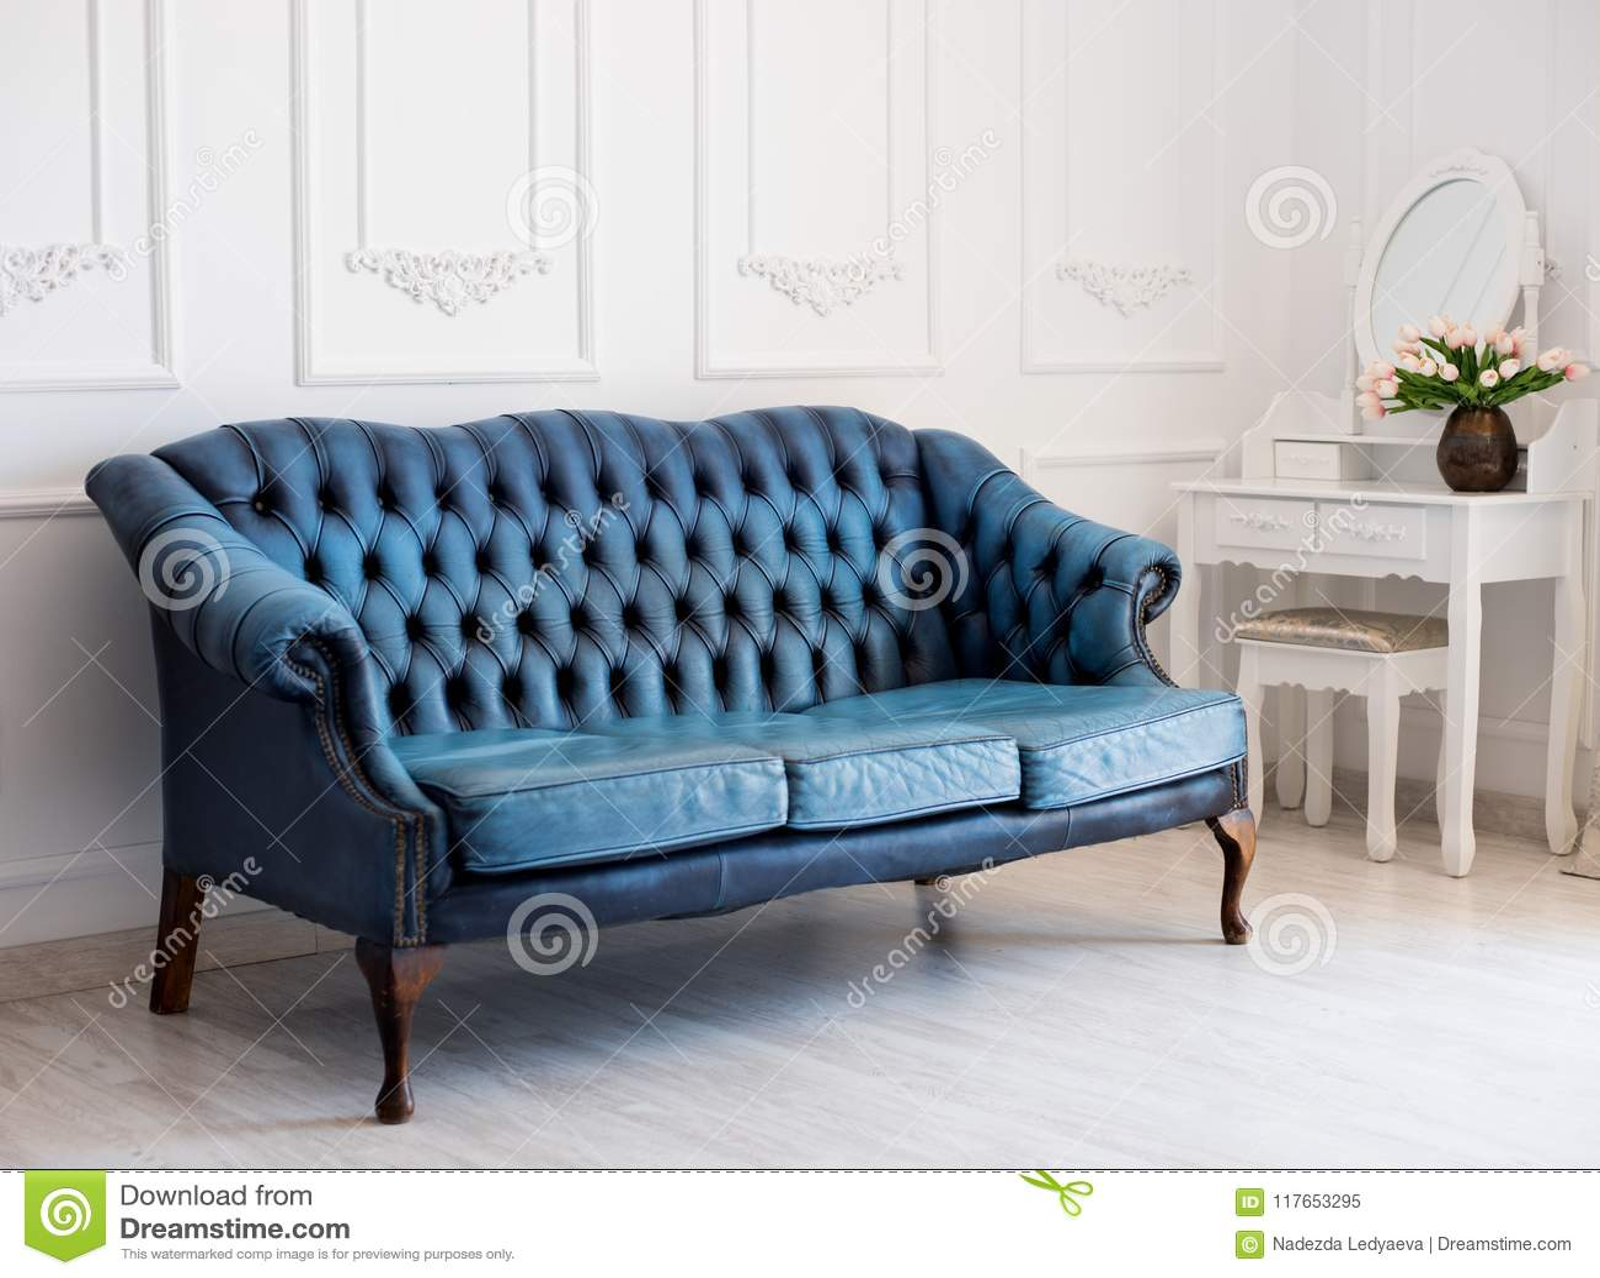 Astonishing Luxurious Leather Blue Sofa Style Vintage In The Room Stock Inzonedesignstudio Interior Chair Design Inzonedesignstudiocom